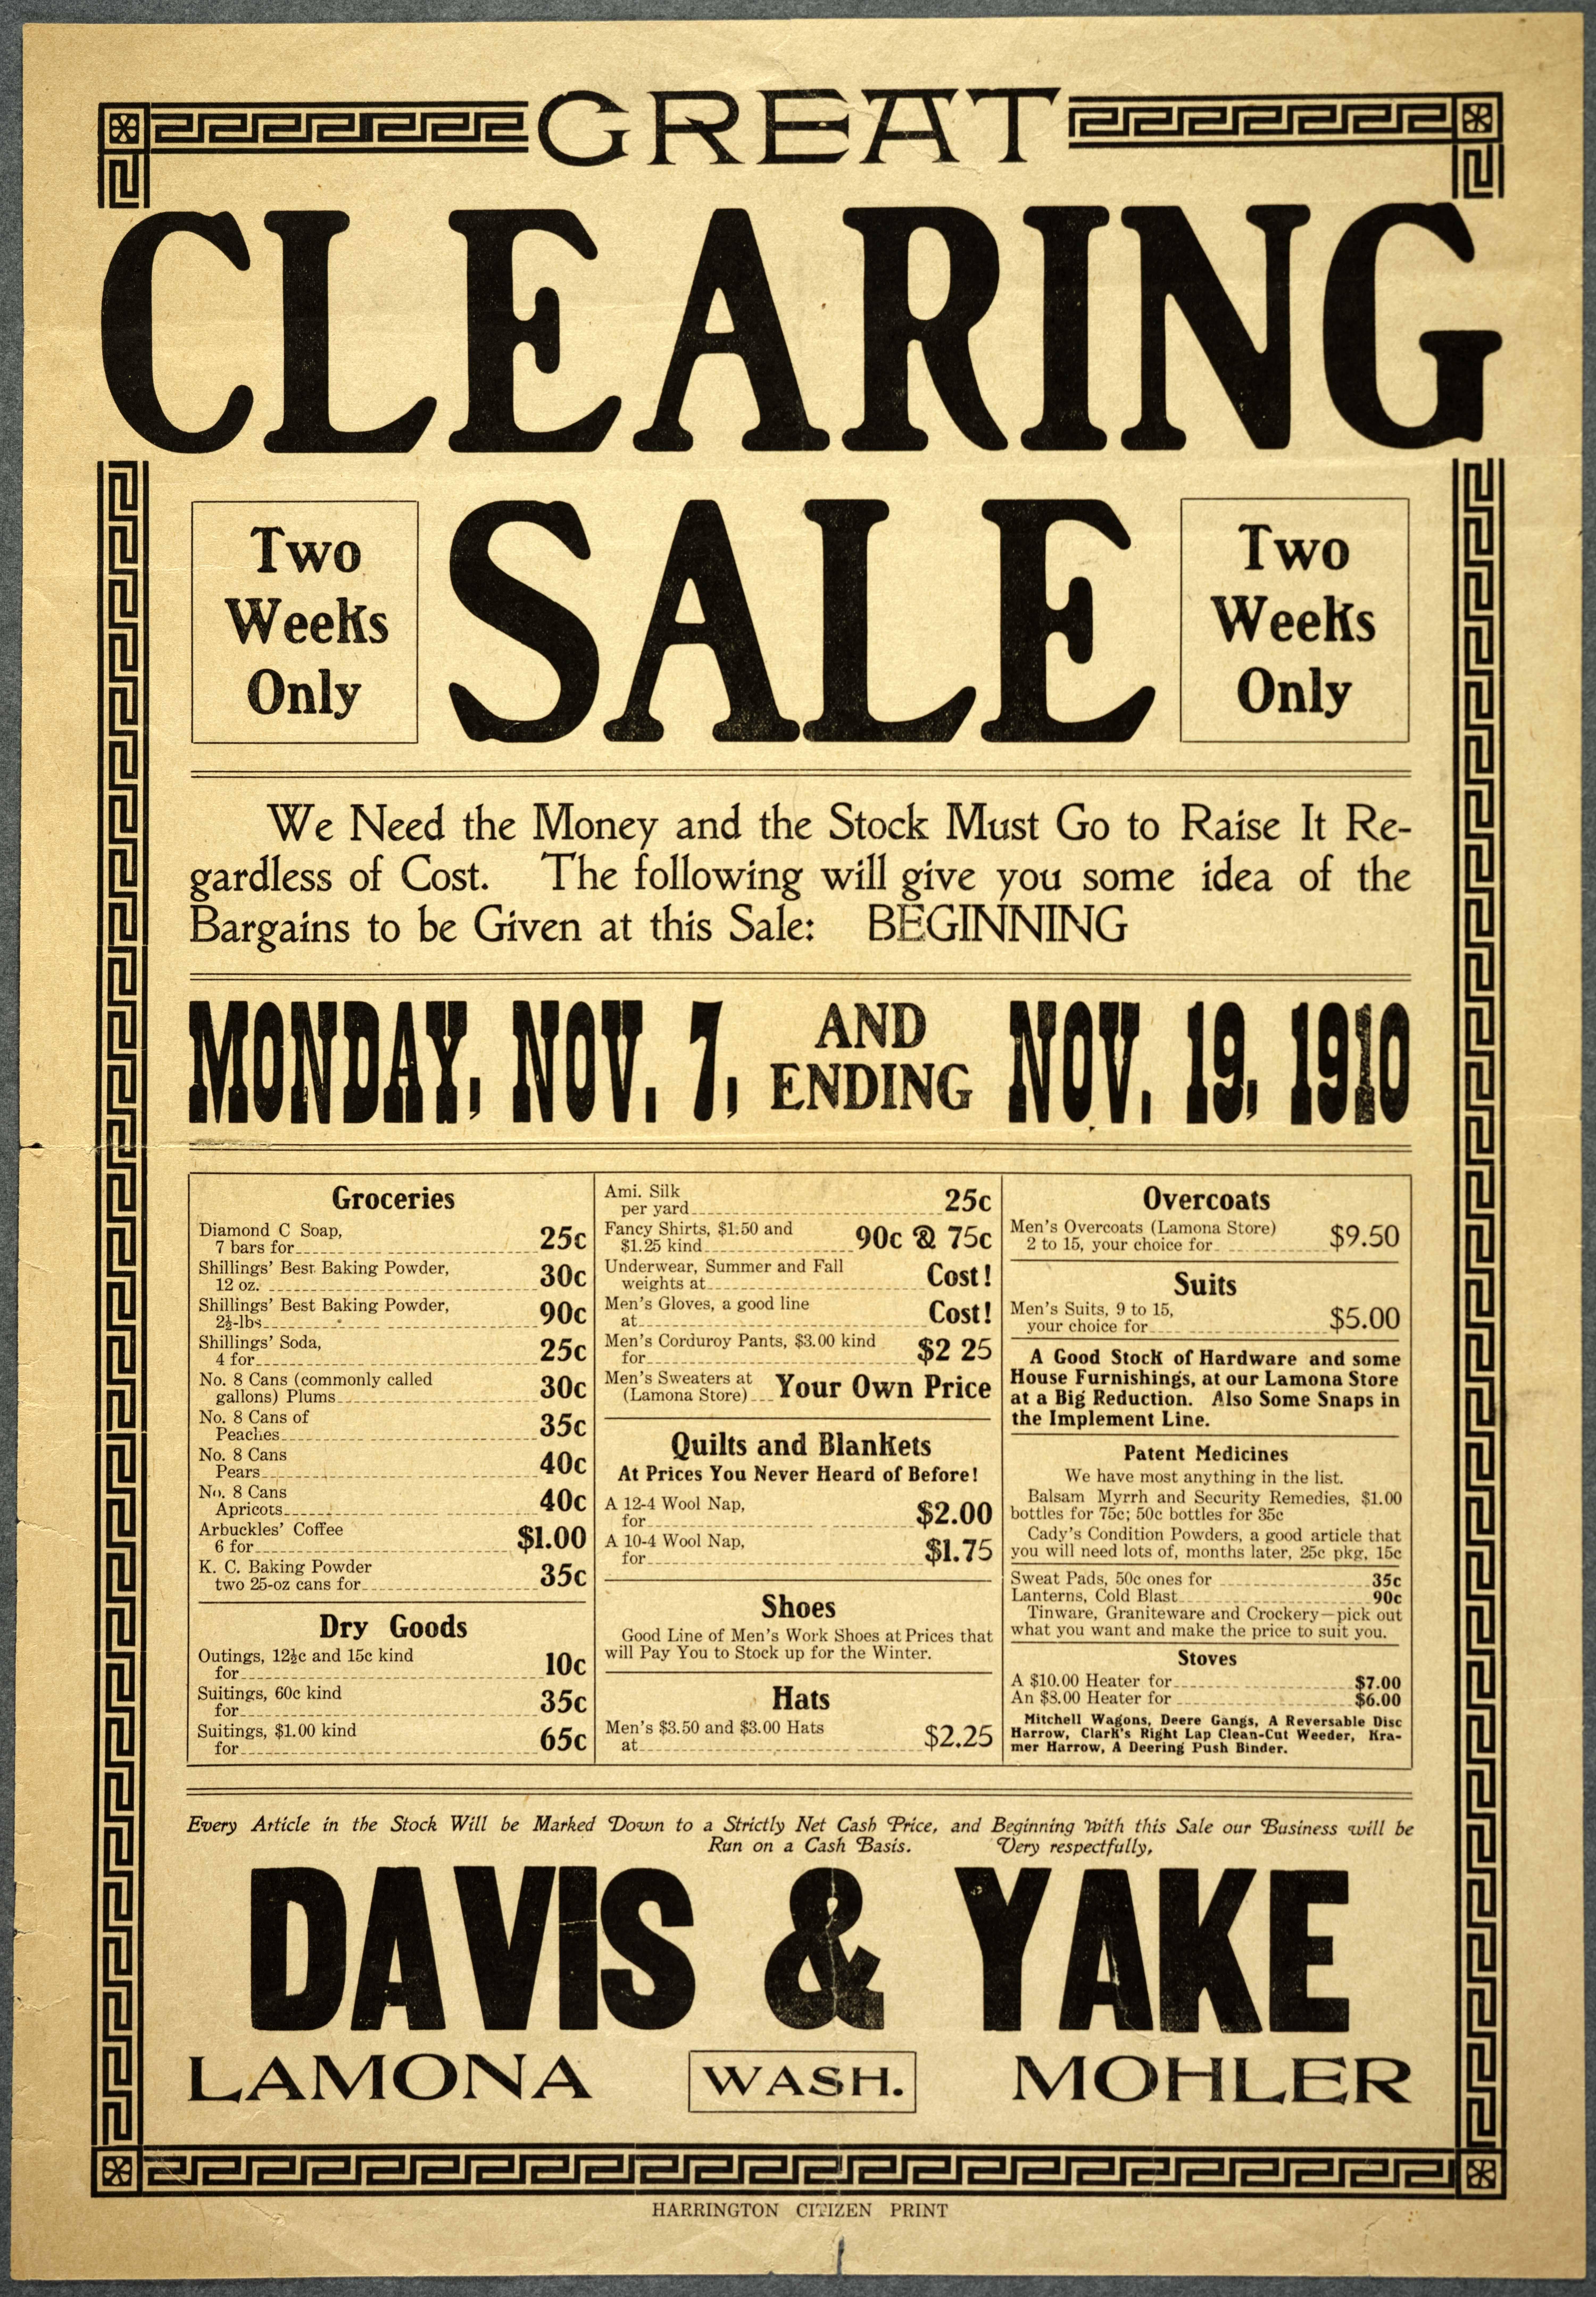 Great Clearing Sale...Davis & Yake, Lamona, Mohler, Wash.